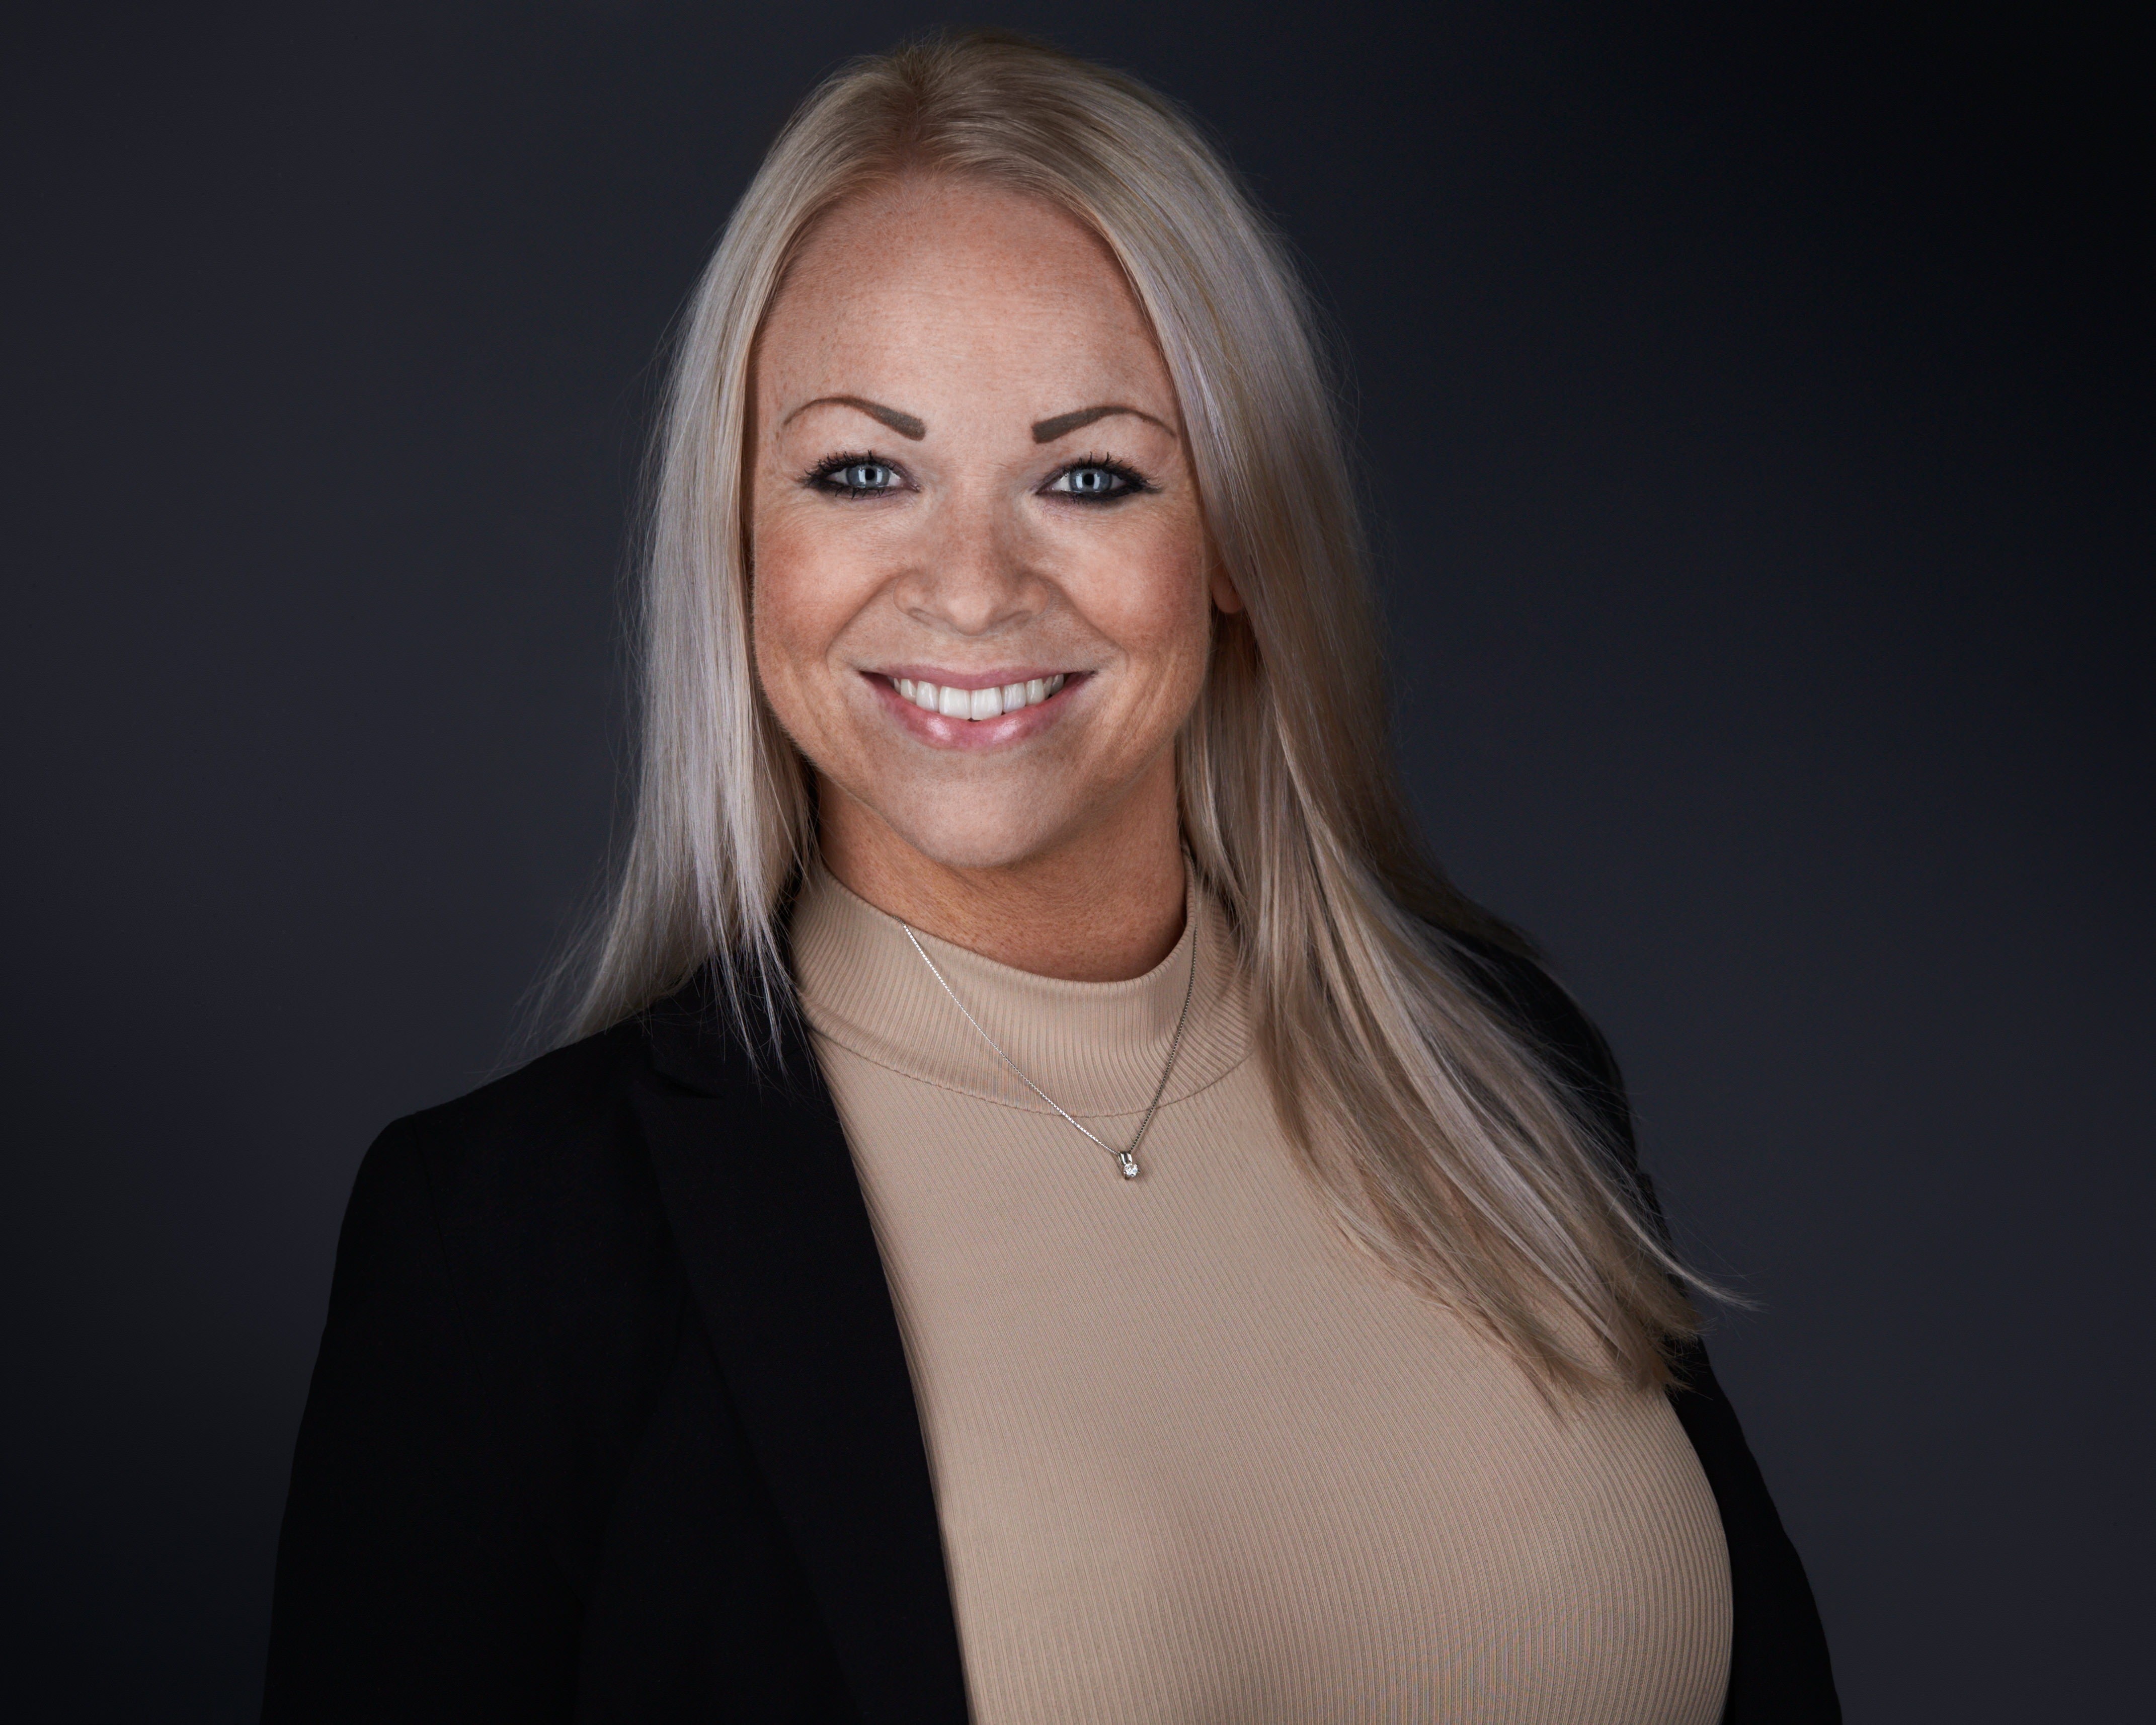 Bente Sofie Larsen